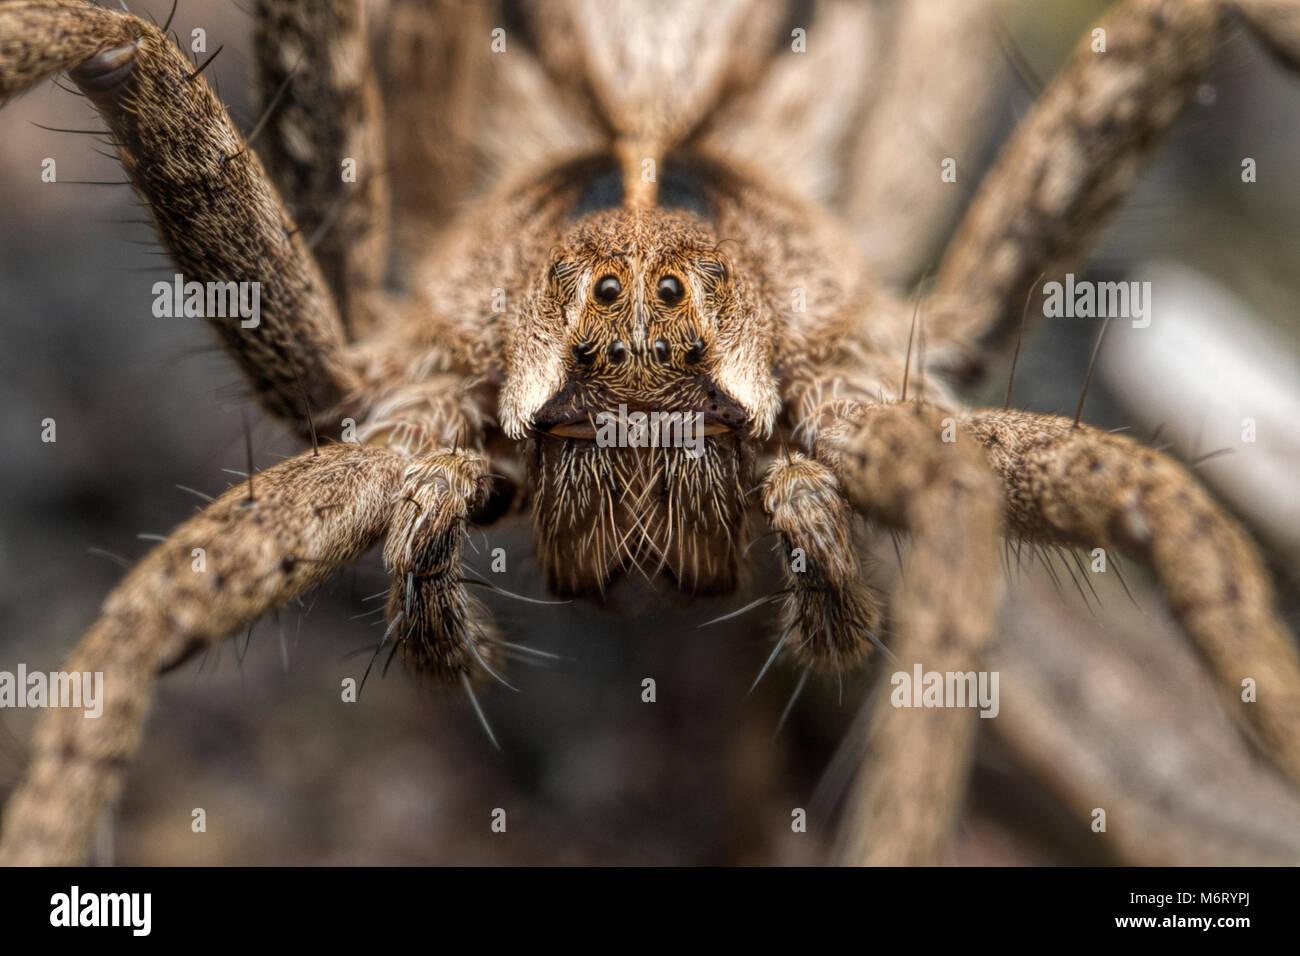 Nursery Web Spider (Pisaura mirabilis) close up of the face Stock Photo